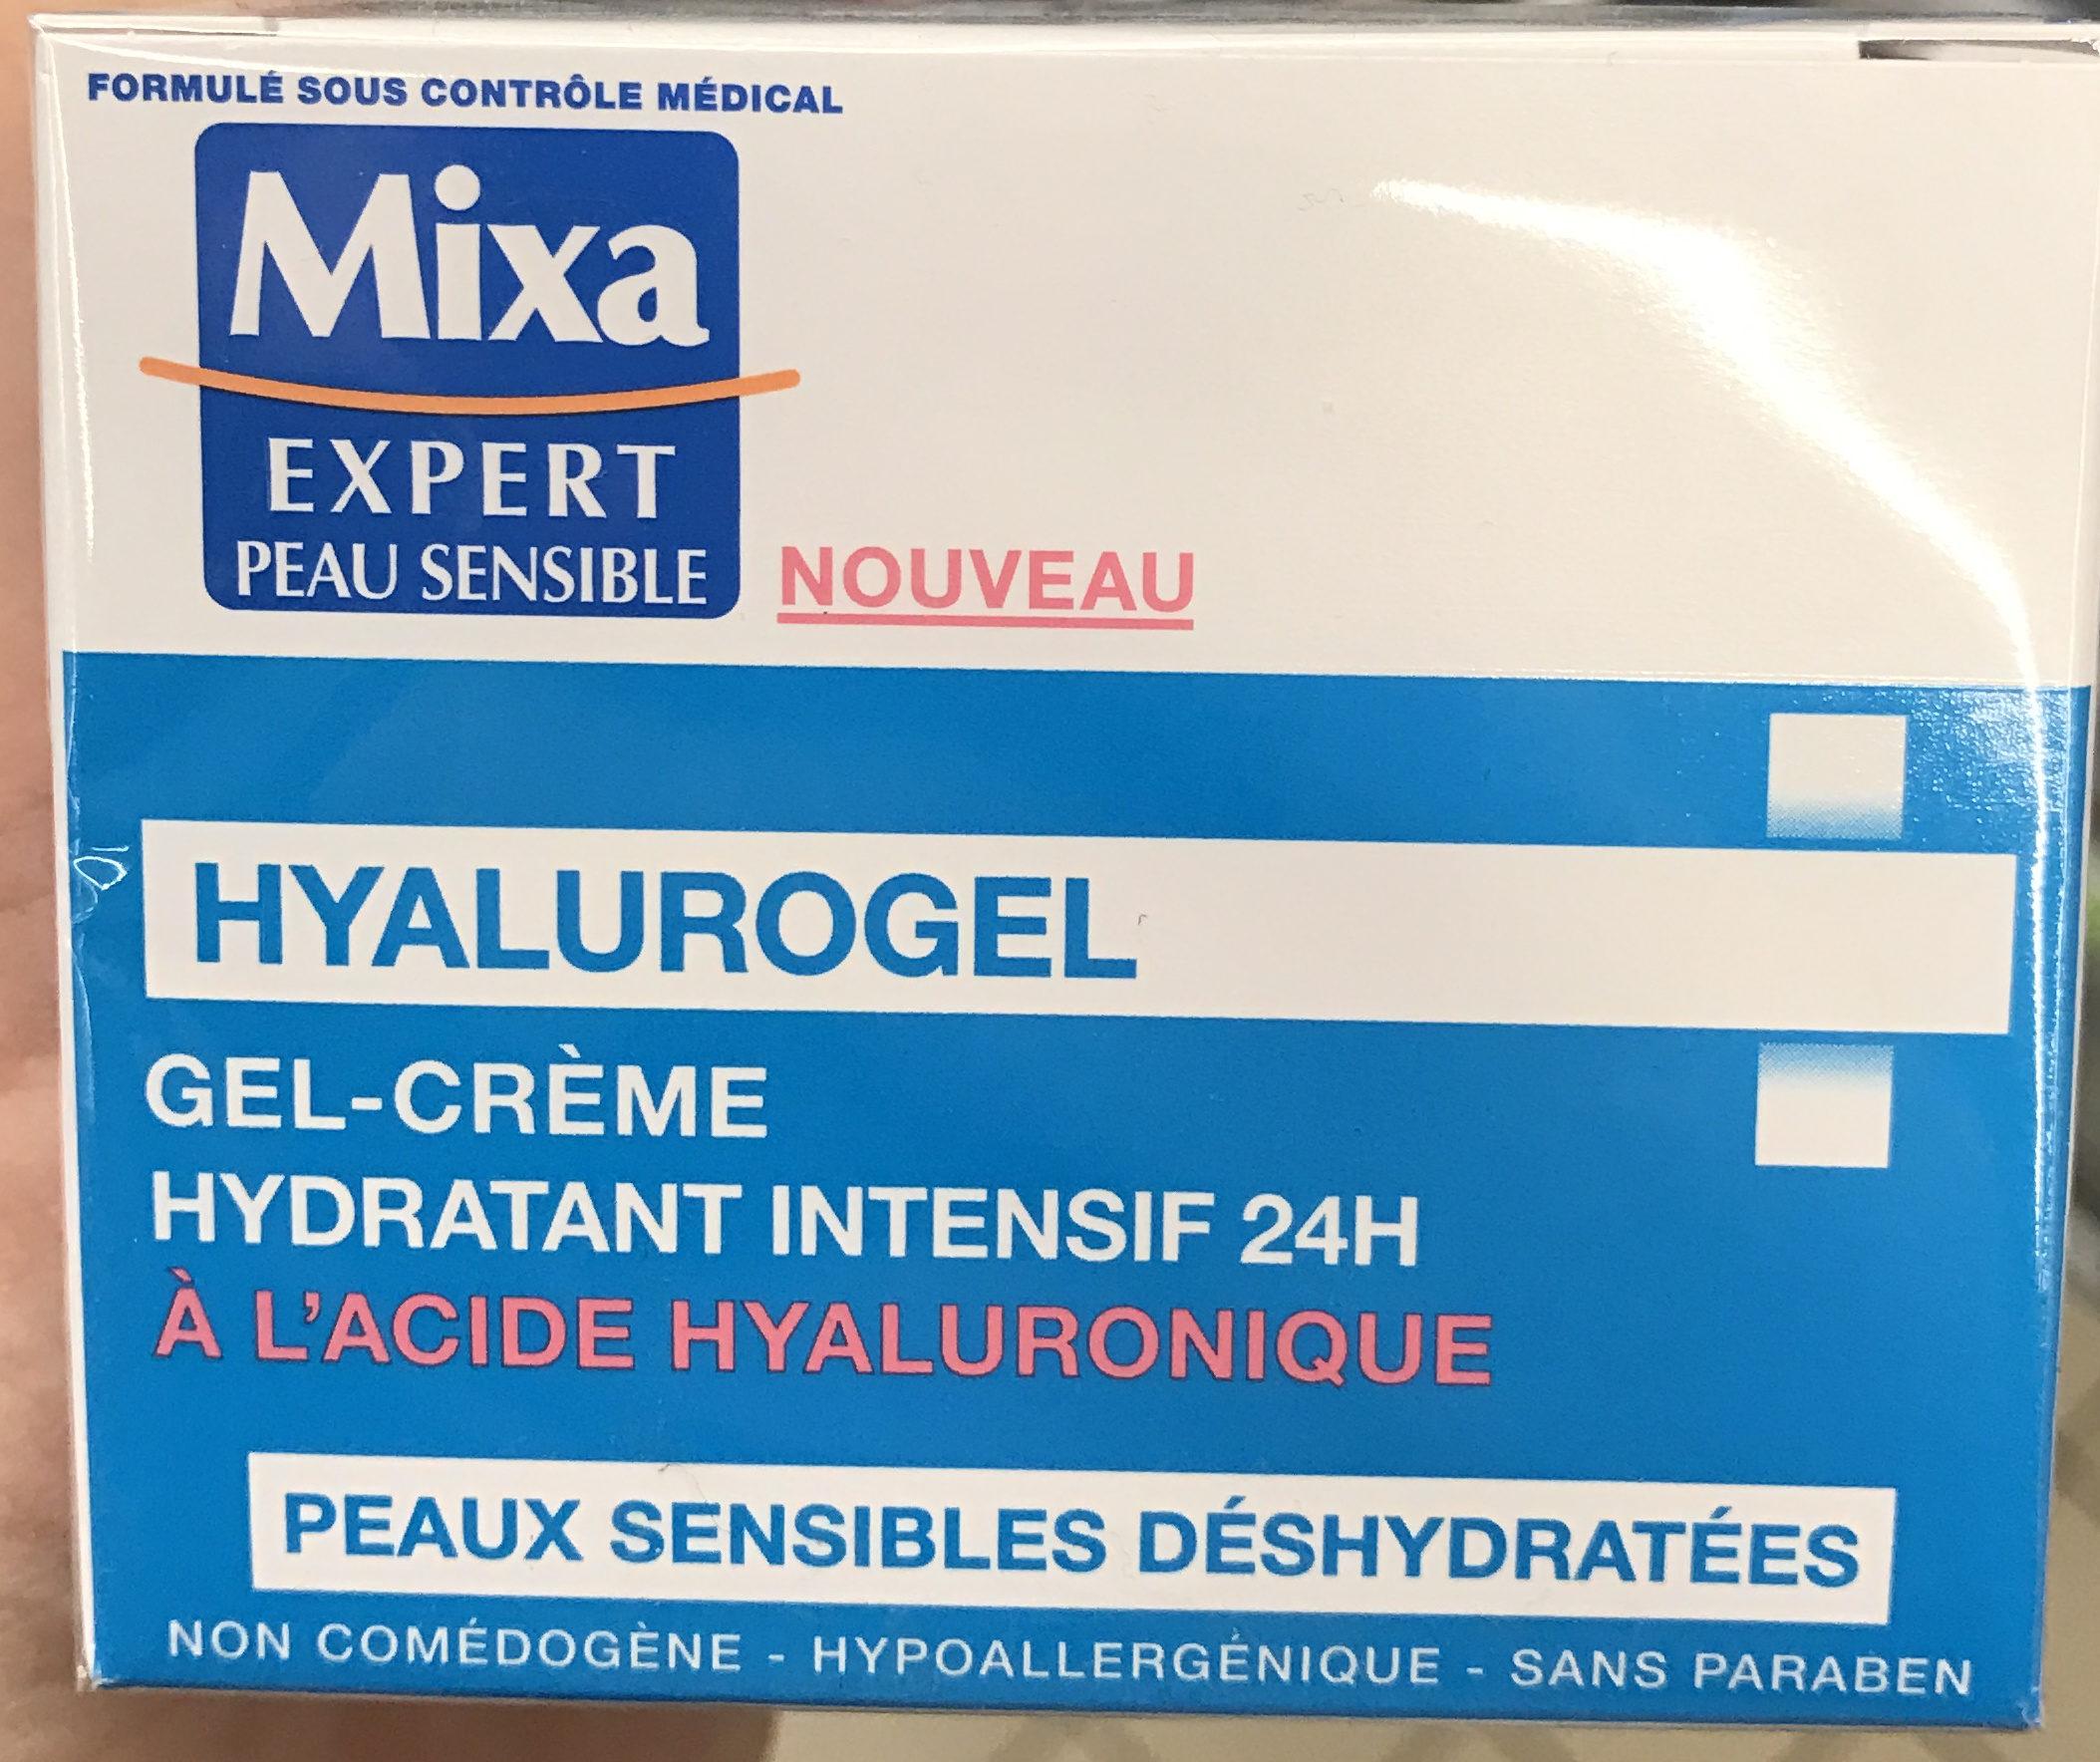 Hyalurogel Gel-Crème Hydratant Intensif 24H - Product